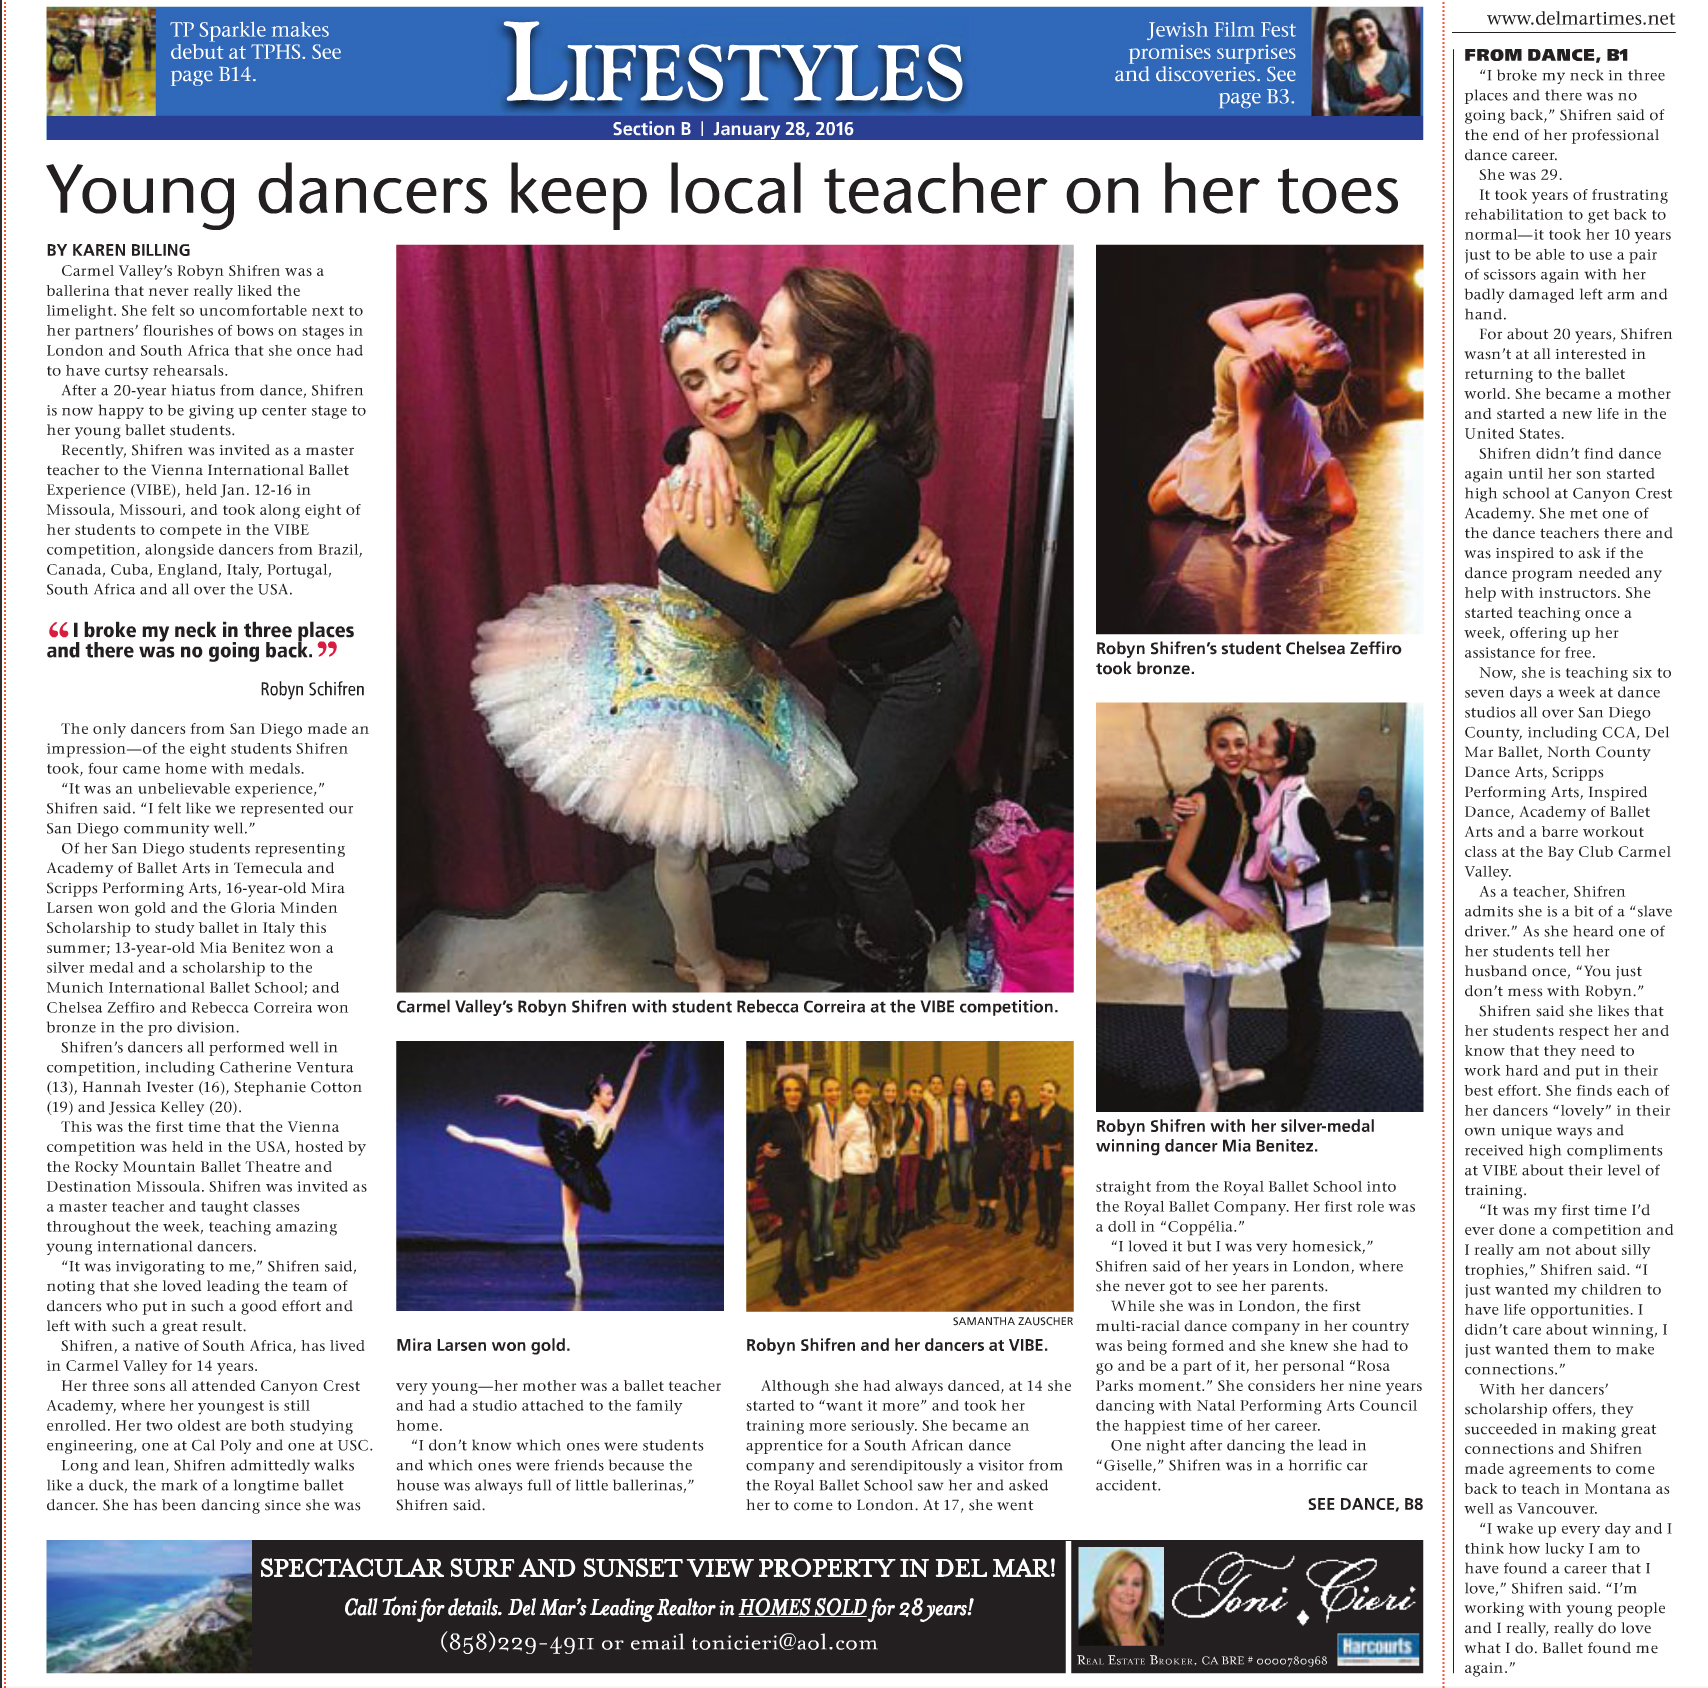 Del Mar Times - full story